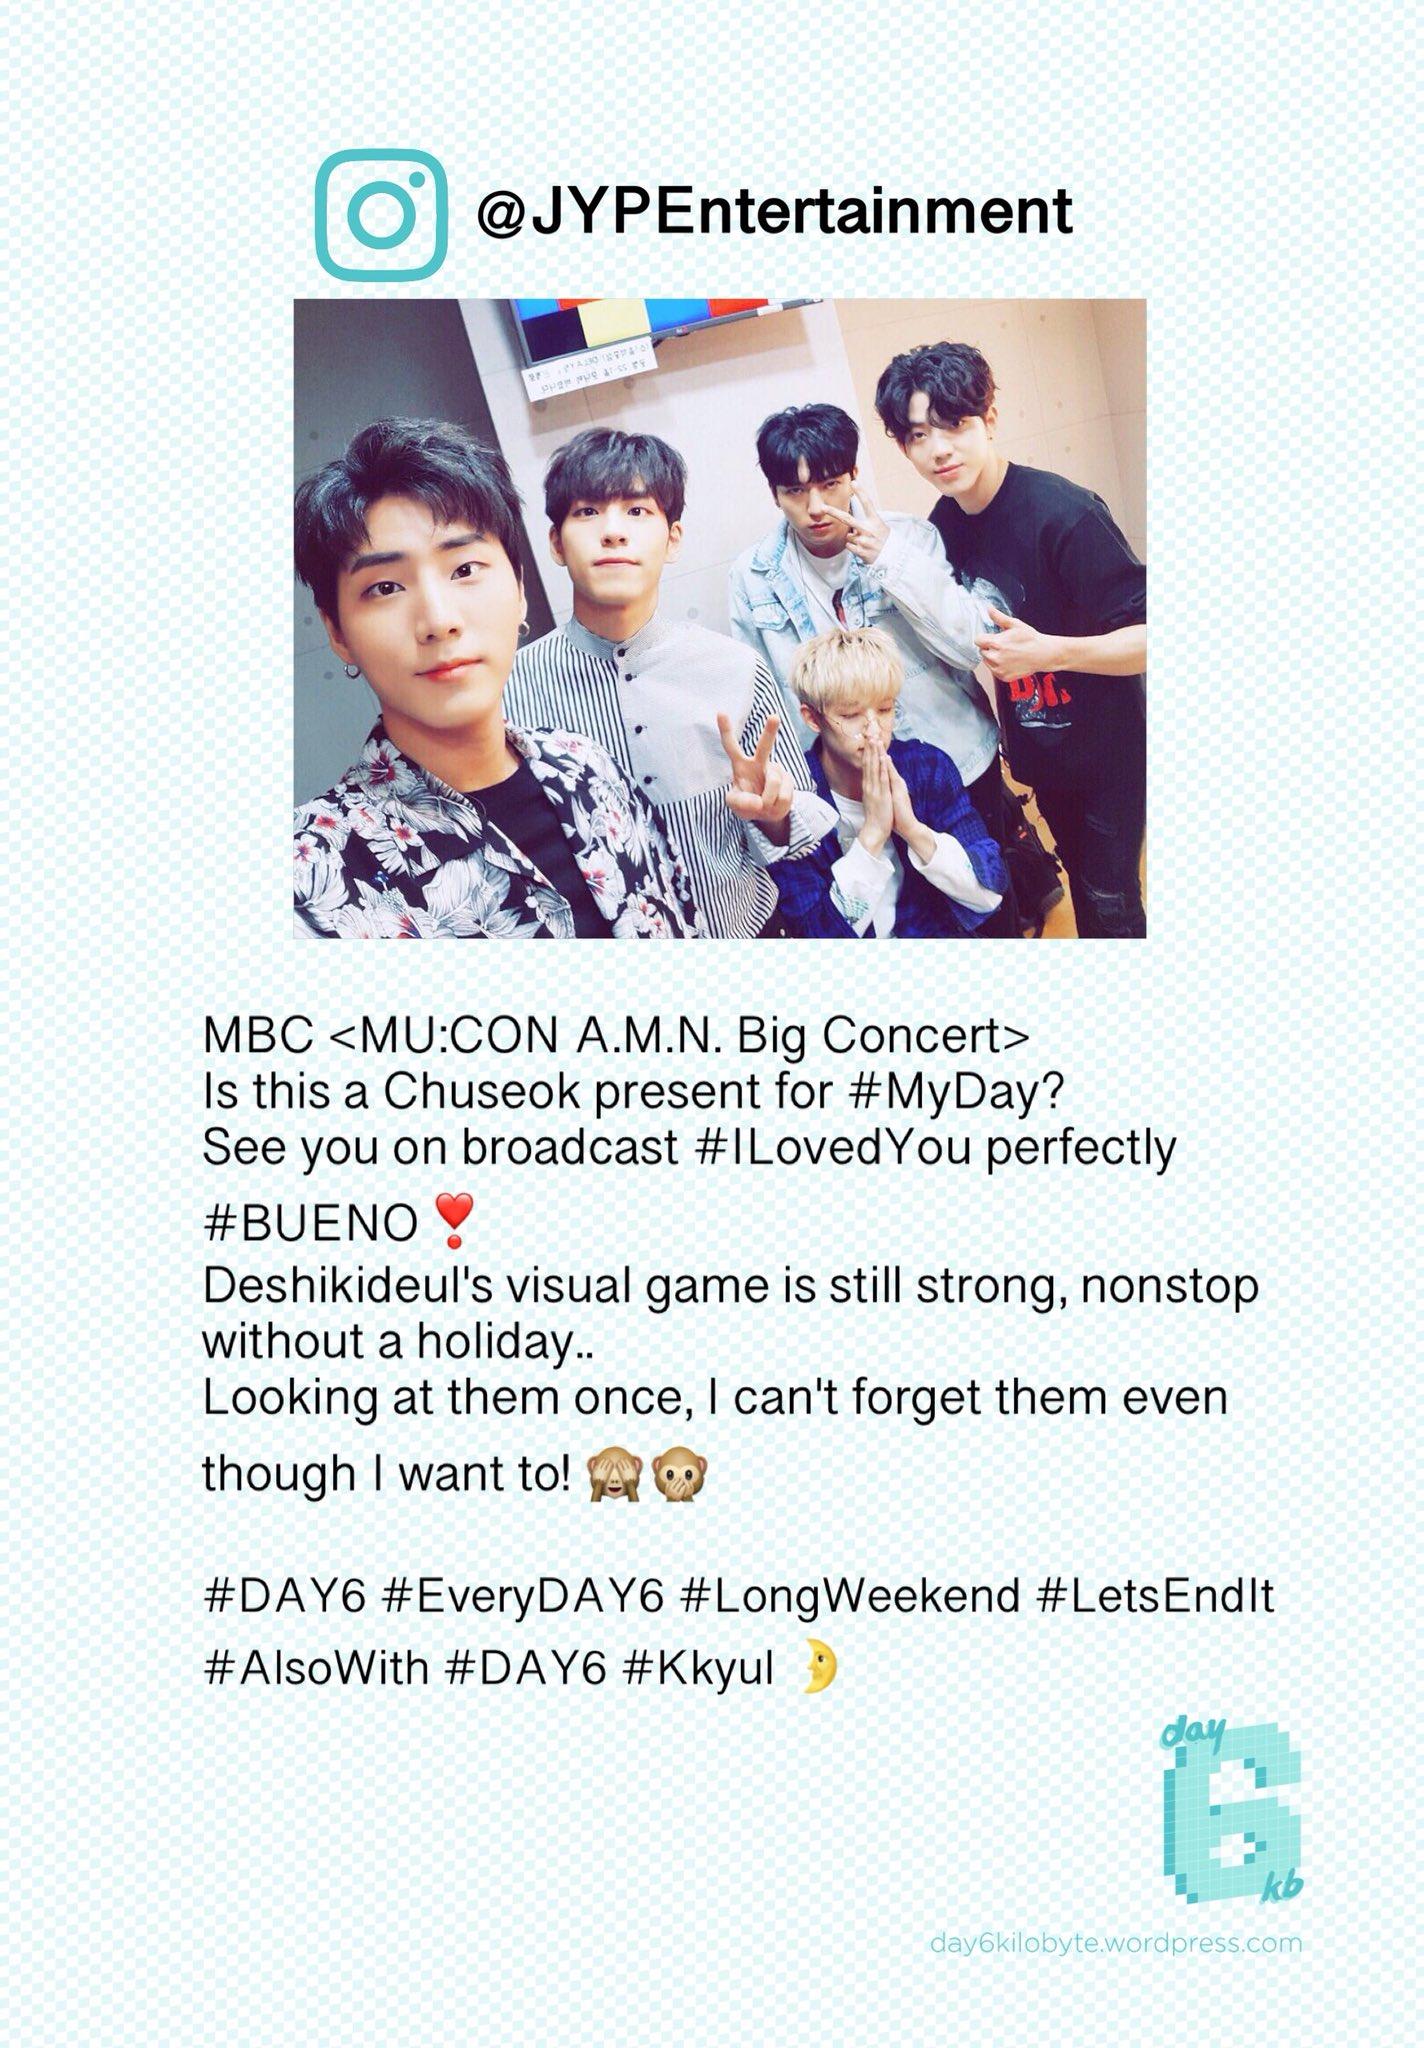 [TRANS] 171007 JYP Entertainment's Instagram Update   https://t.co/XNiHOuwATz https://t.co/ueCp8hRxX9